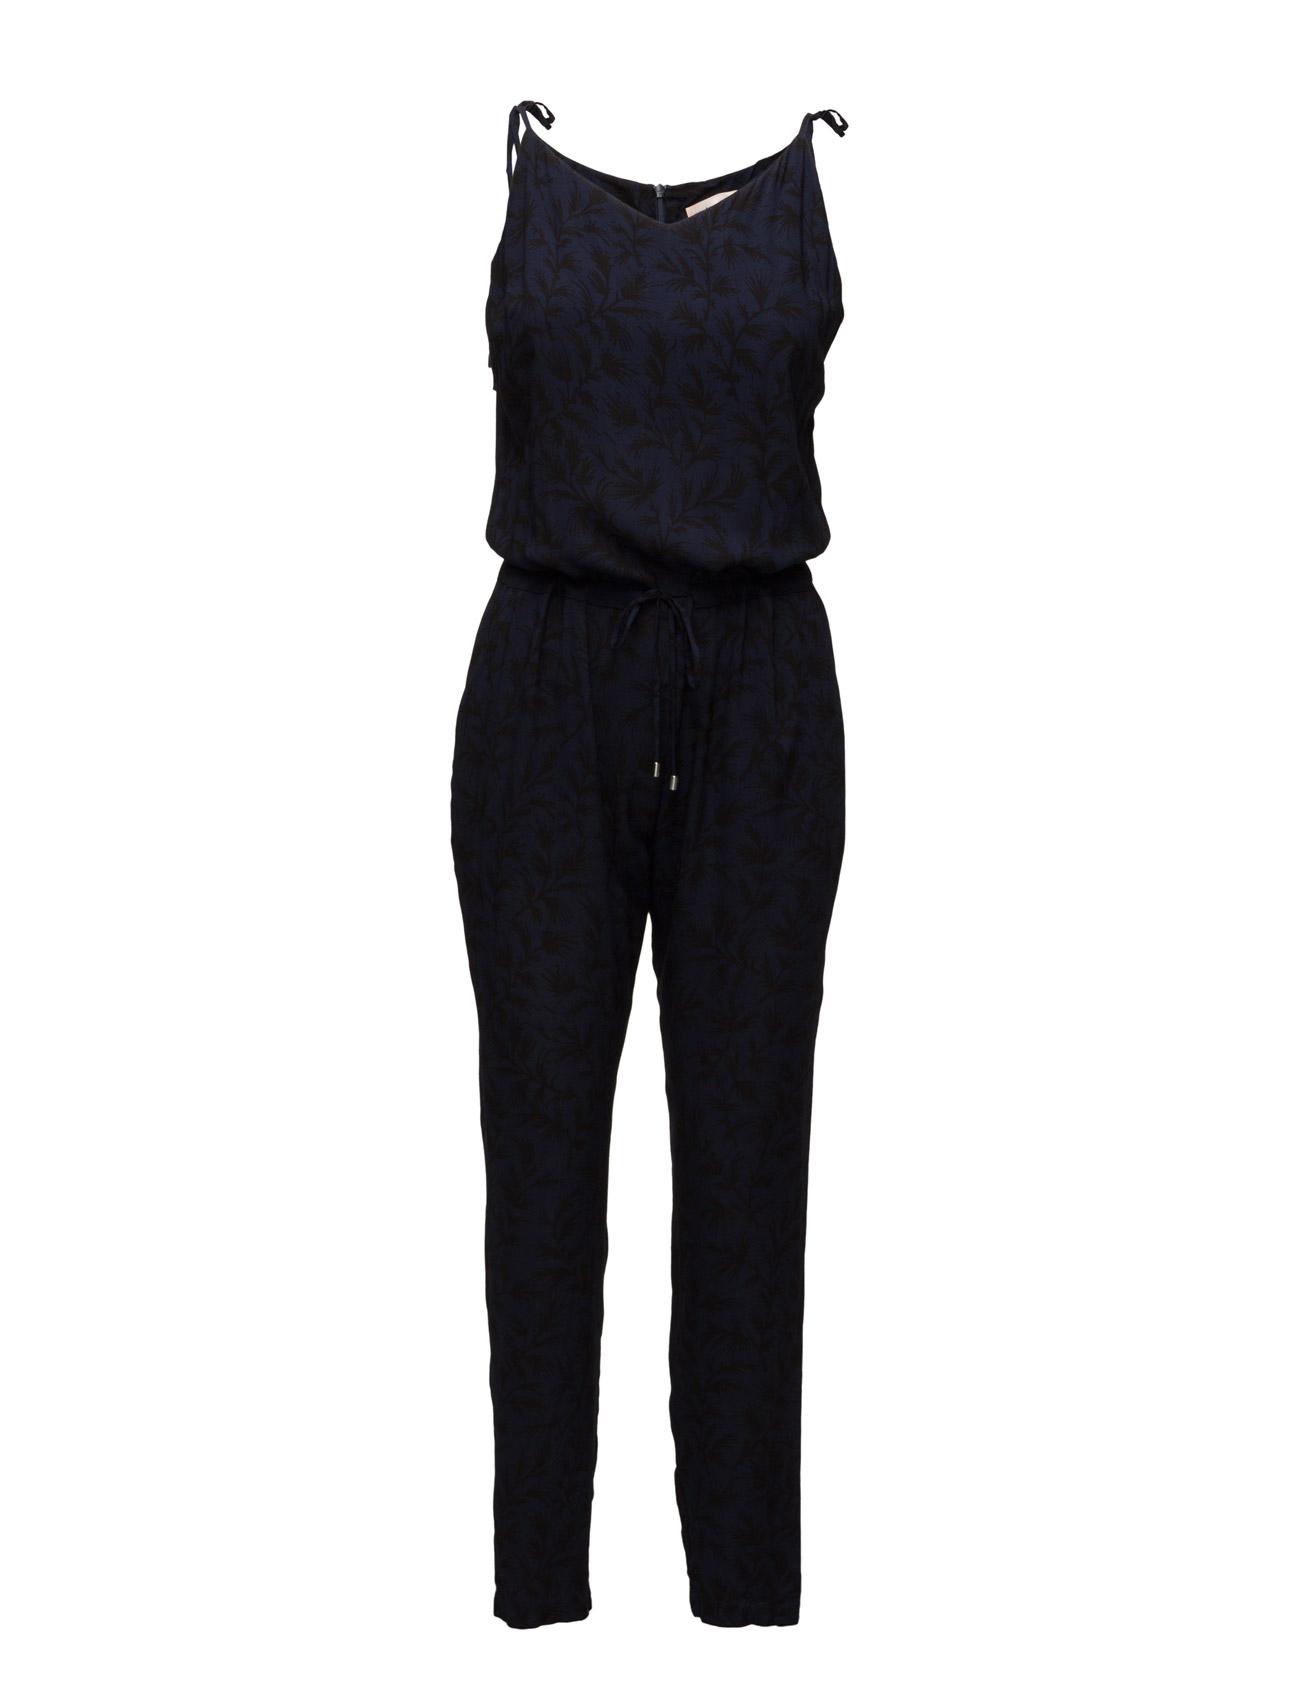 Prana Custommade  til Kvinder i Navy Blazer